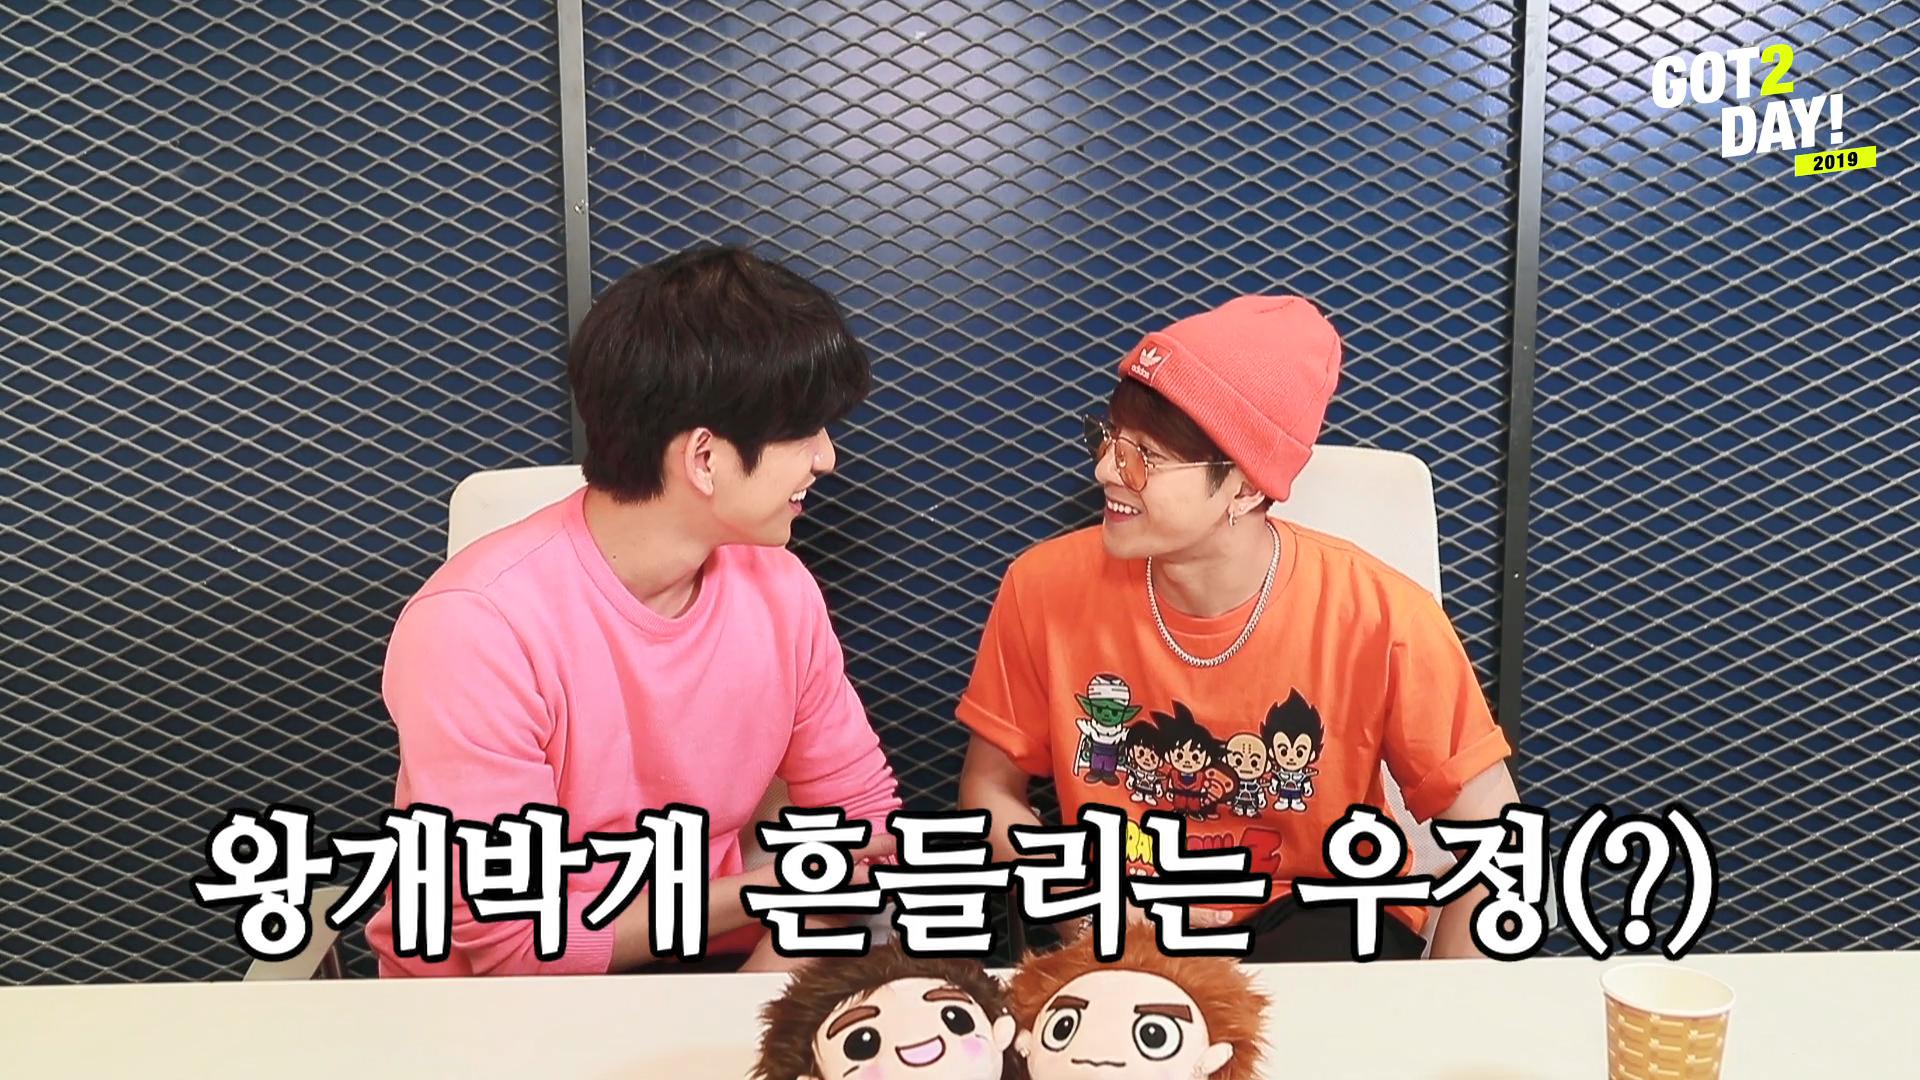 [GOT2DAY 2019] 13. Jackson & Jinyoung